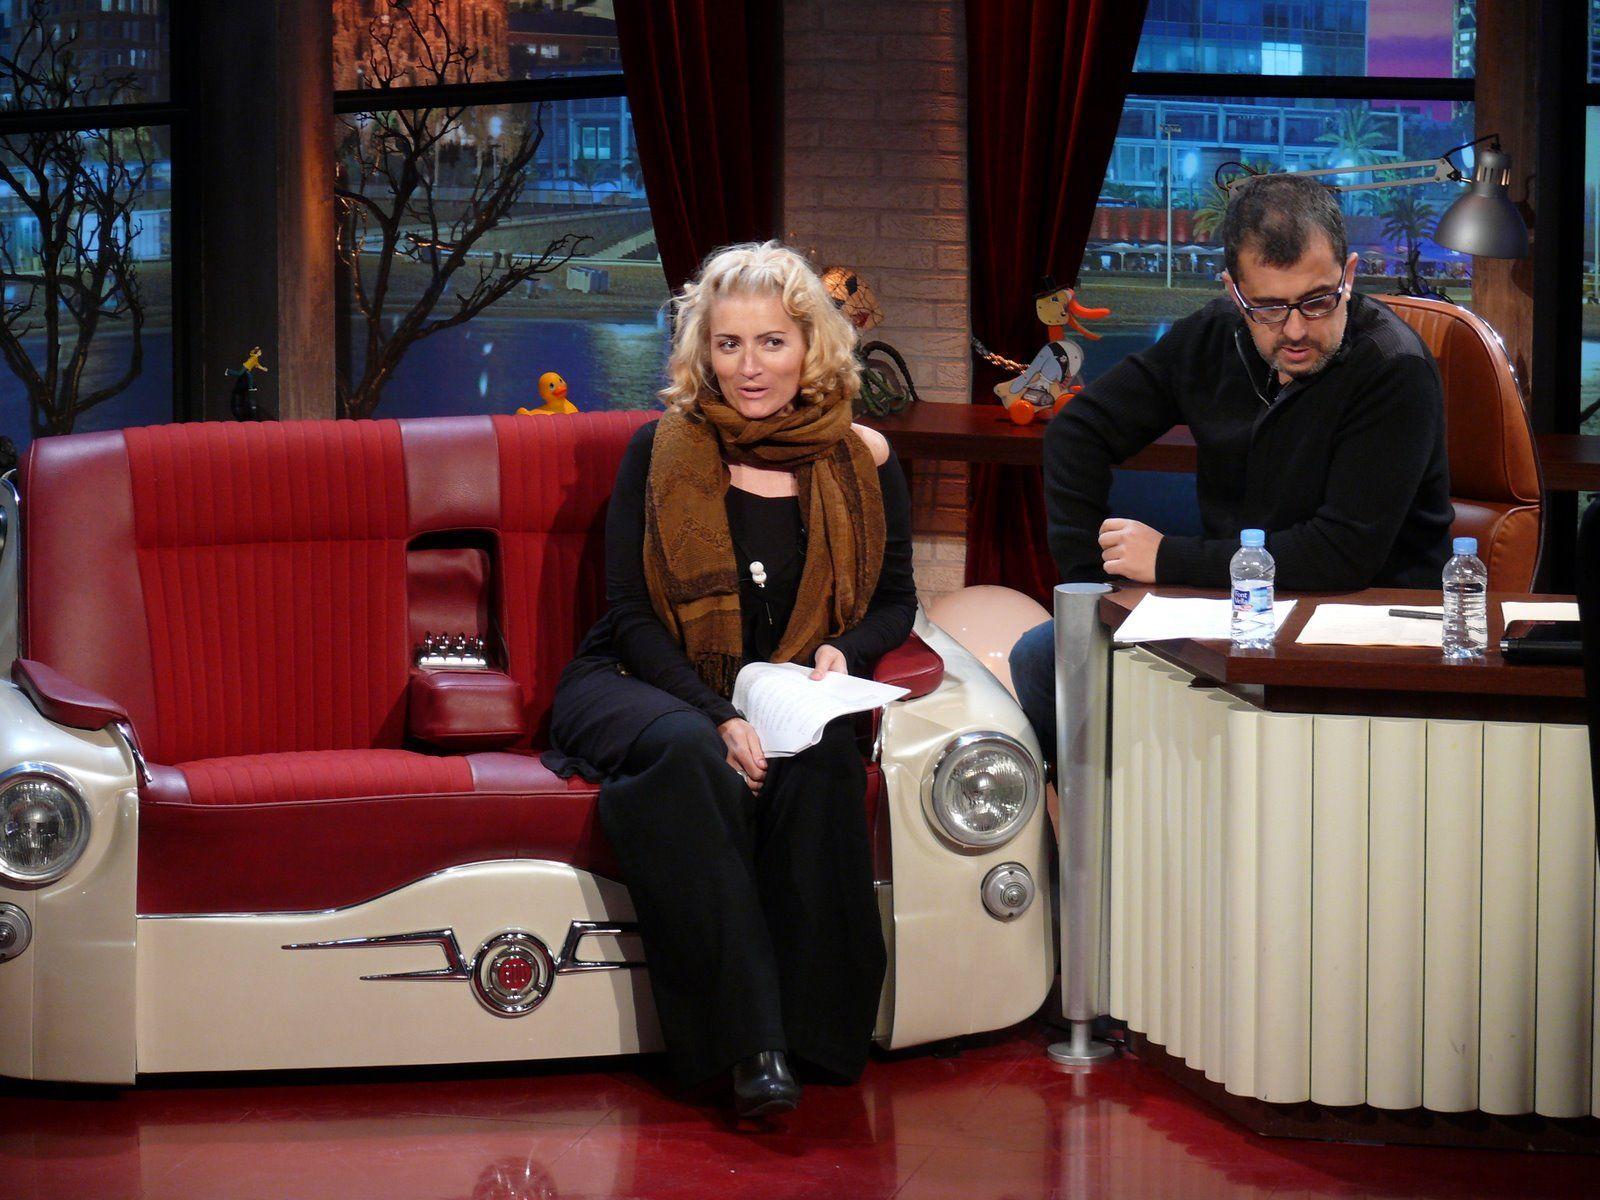 Silvia Abril Andreu Buenafuente Bfn Buenafuente T V Show Sofa 600 Vespa Chair